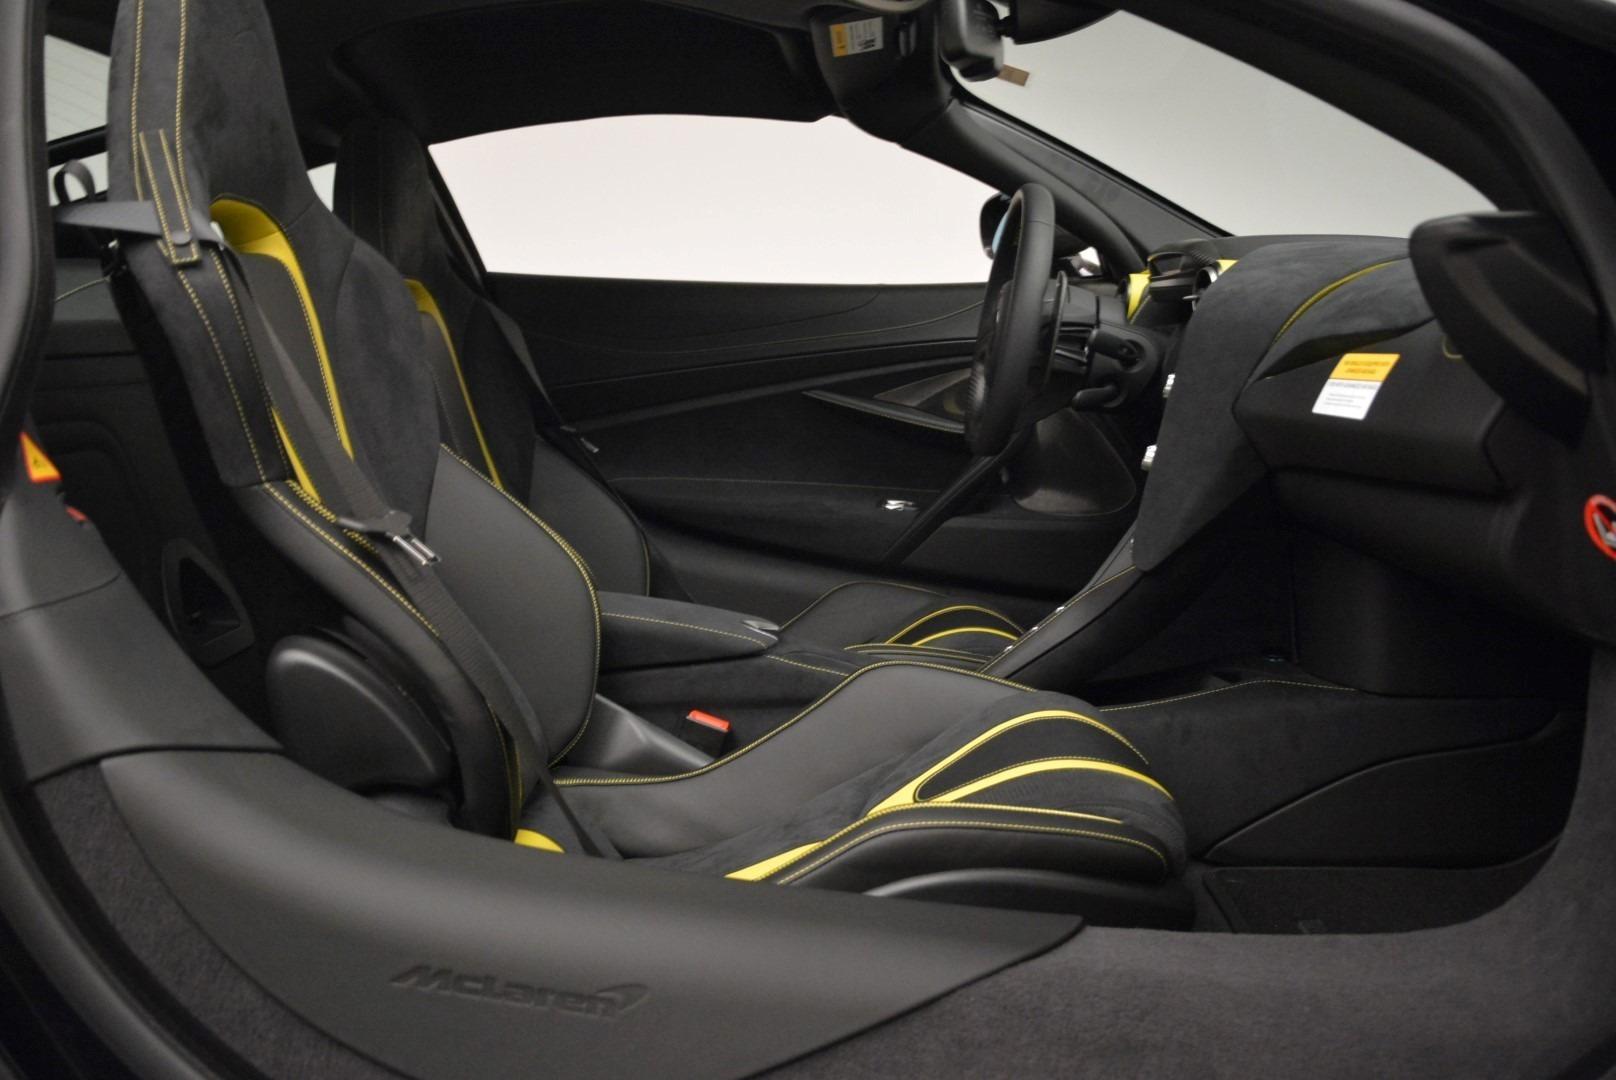 Used 2018 McLaren 720S Coupe For Sale In Westport, CT 2474_p19